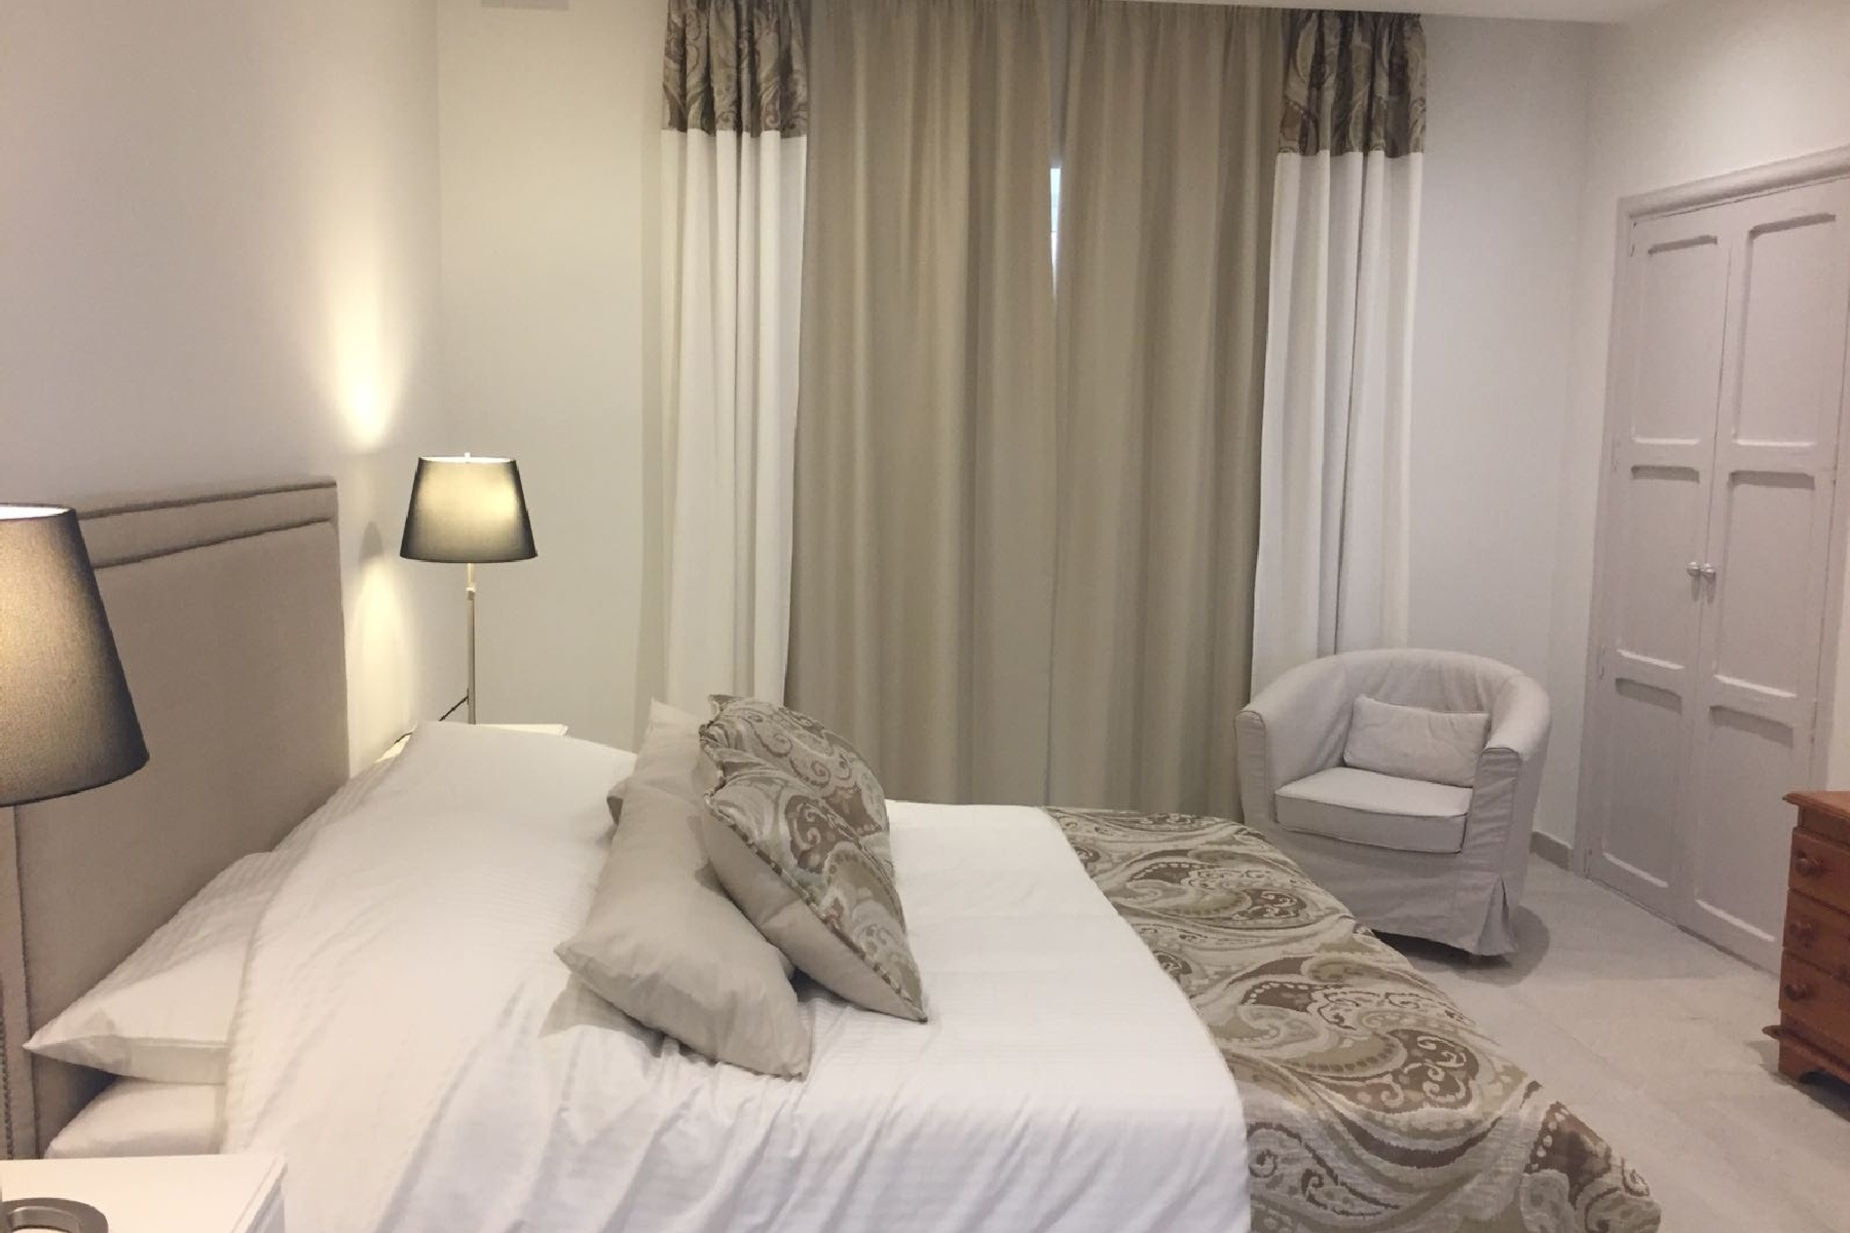 0 bed Apartment For Rent in Sliema, Sliema - thumb 6